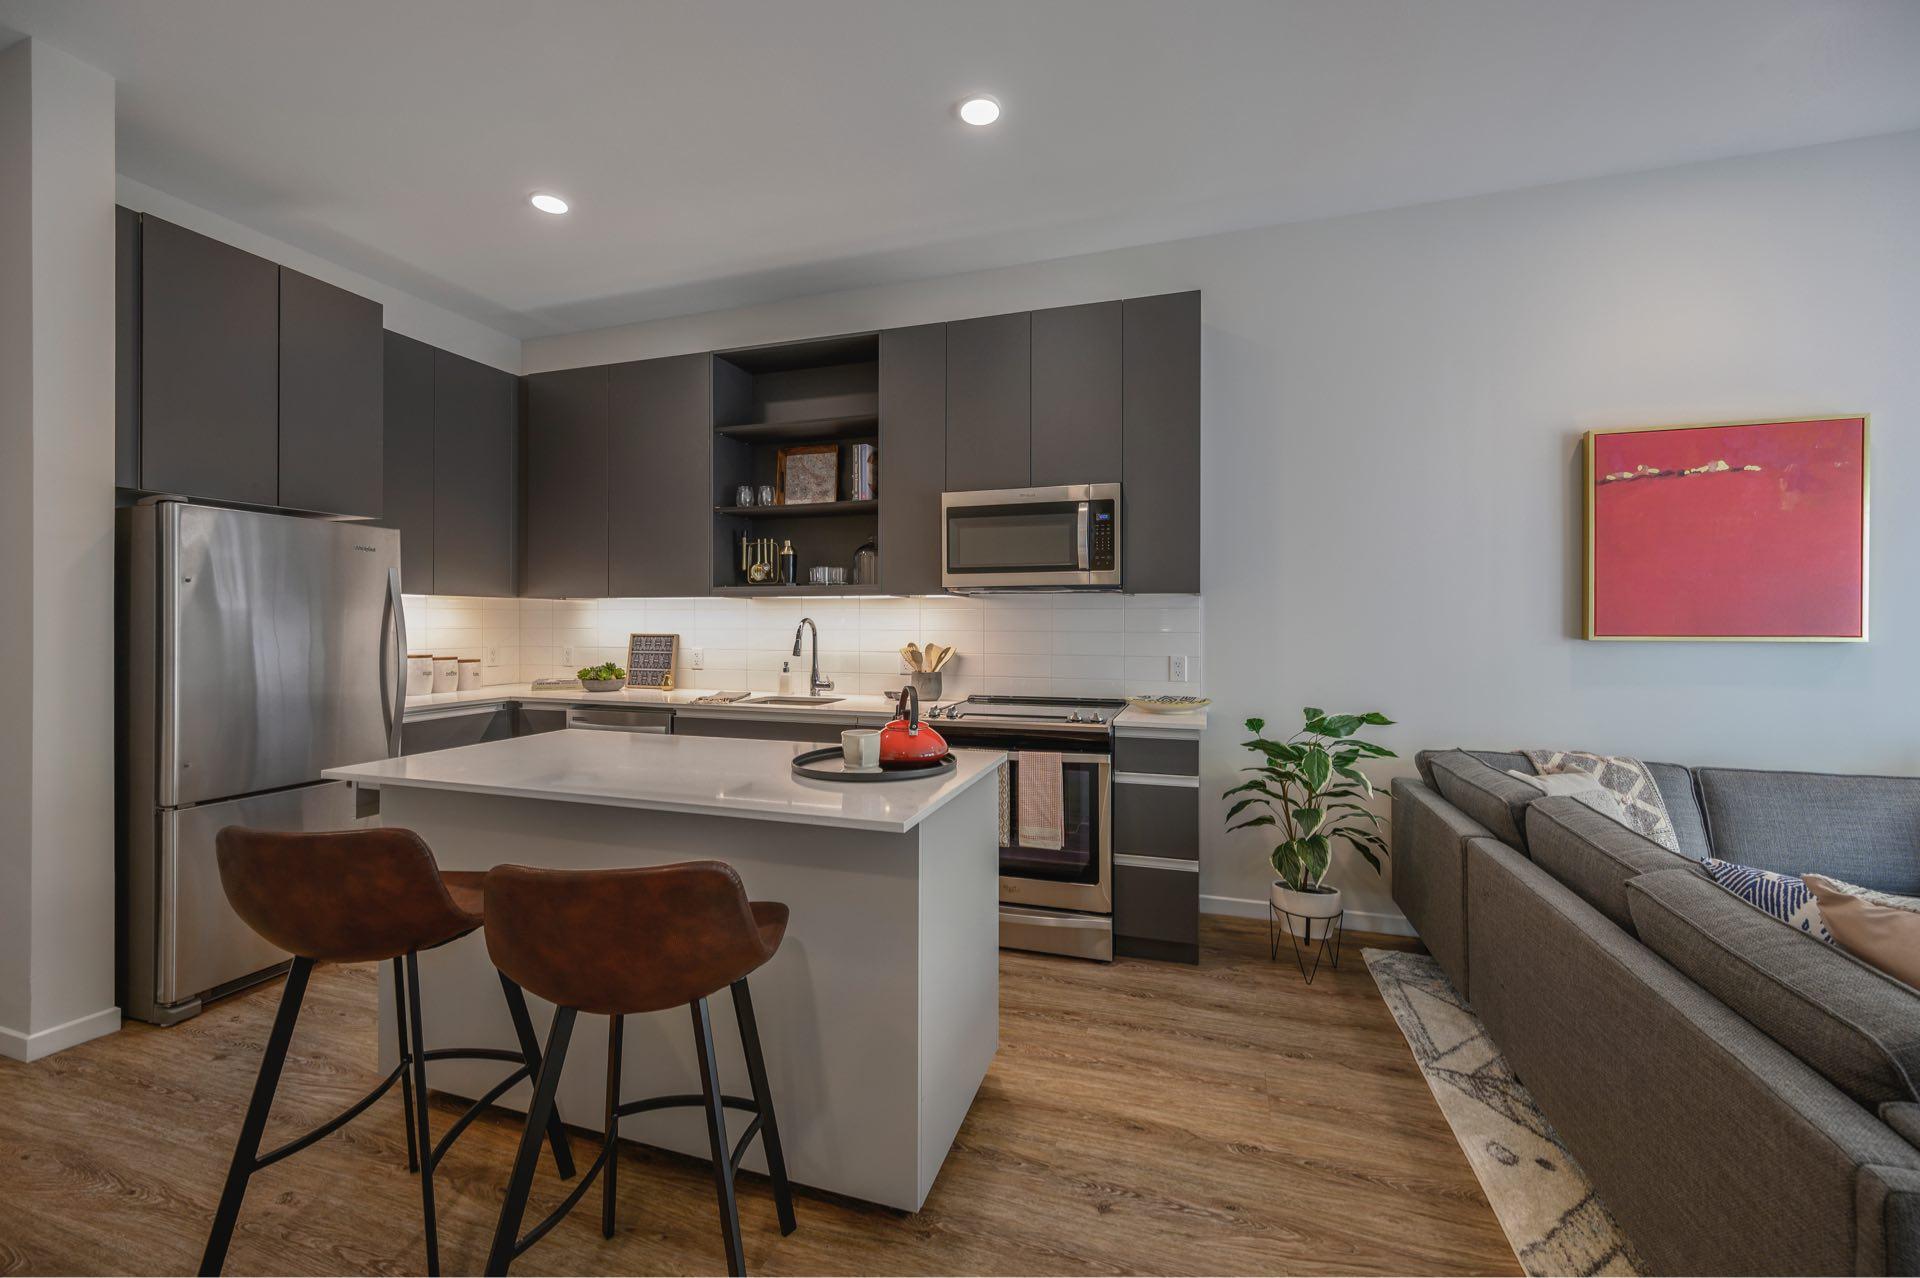 Apartments img 5